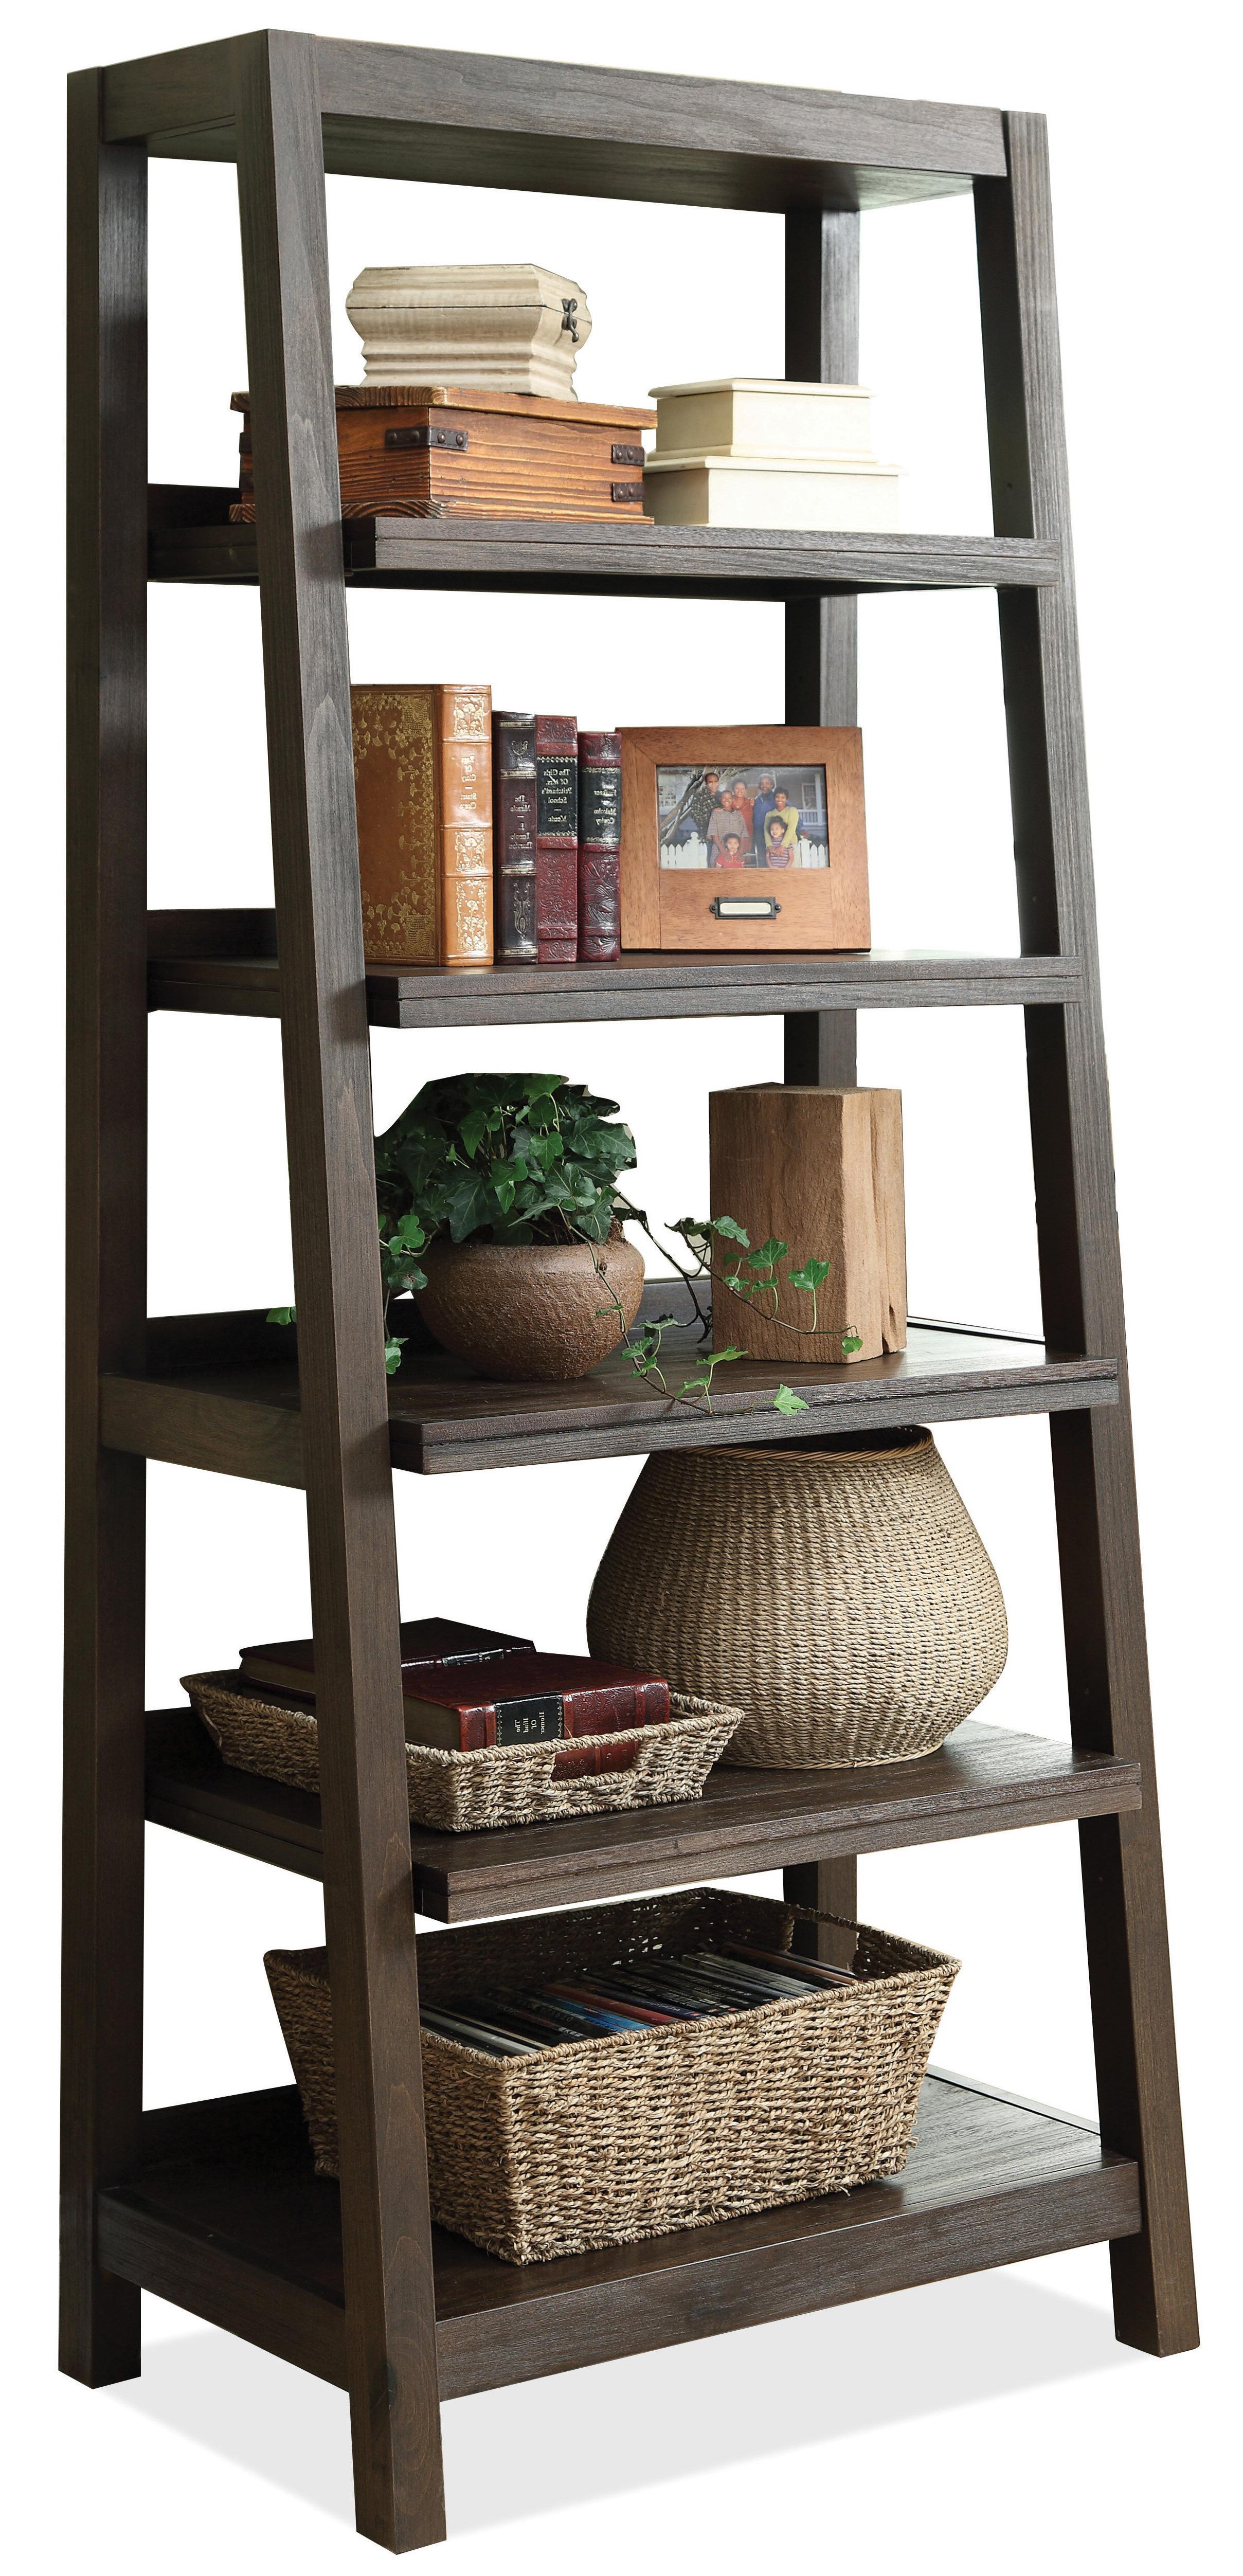 2020 Riddleville Ladder Bookcases Inside Promenade Ladder Bookcase (View 1 of 20)